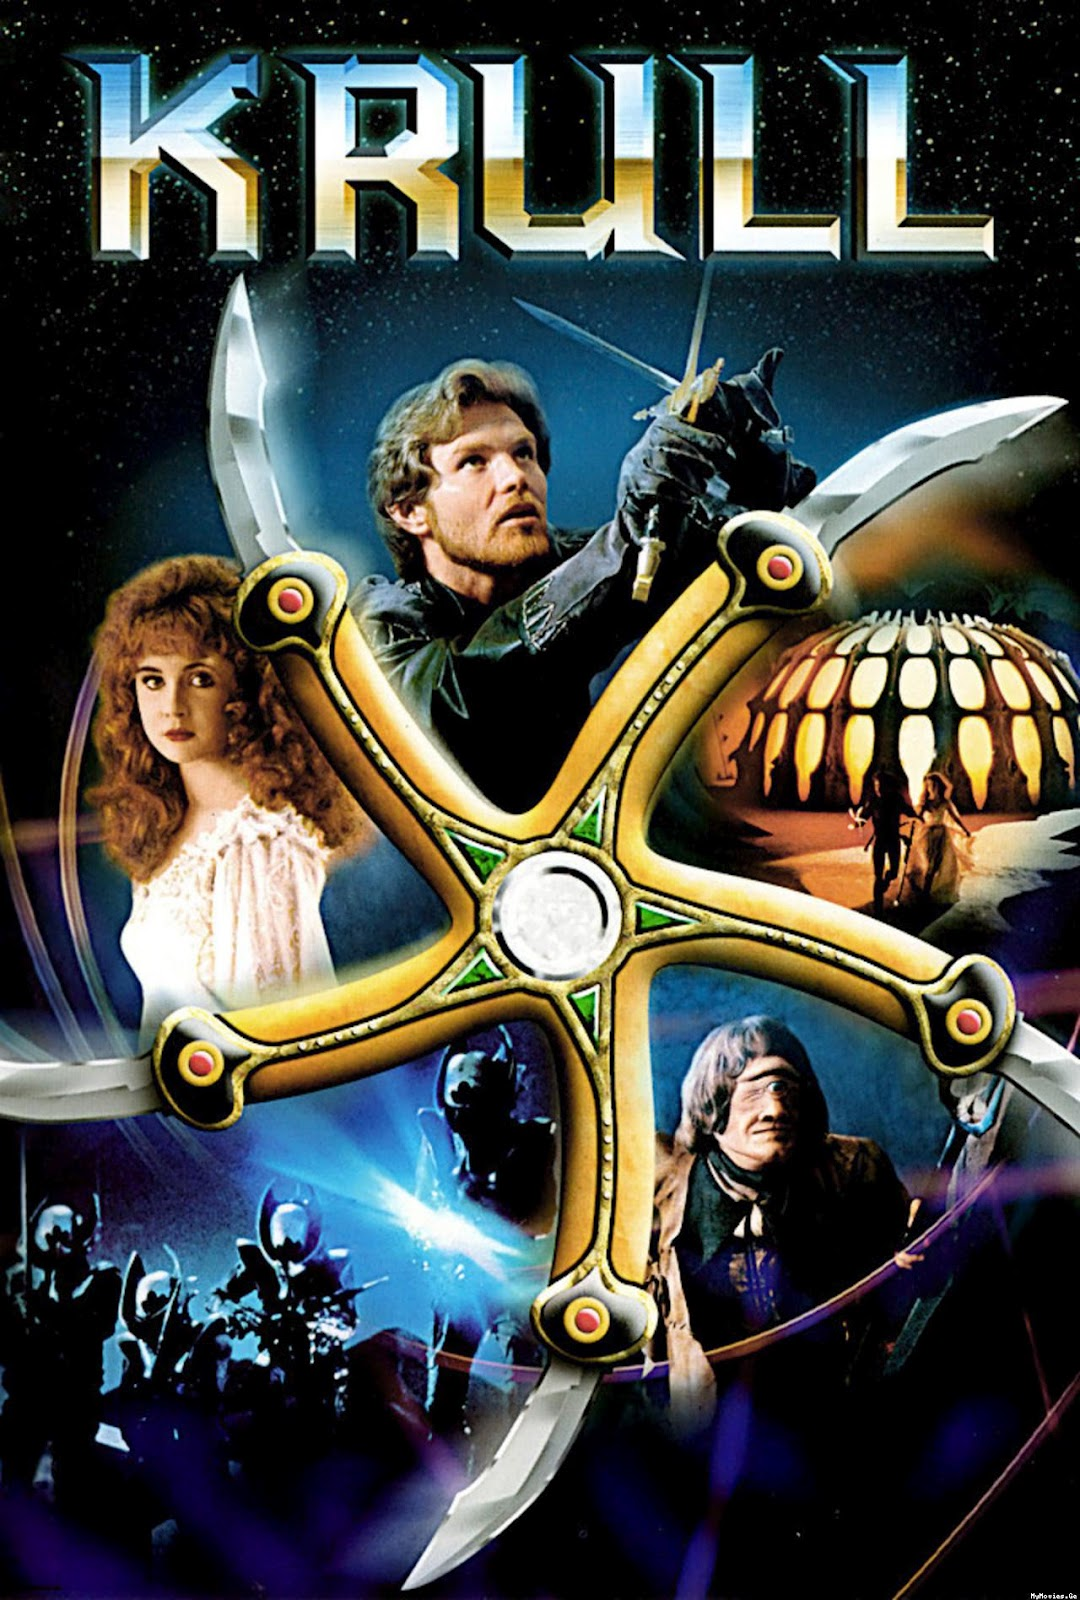 krull bravemoviescom watch movies online download